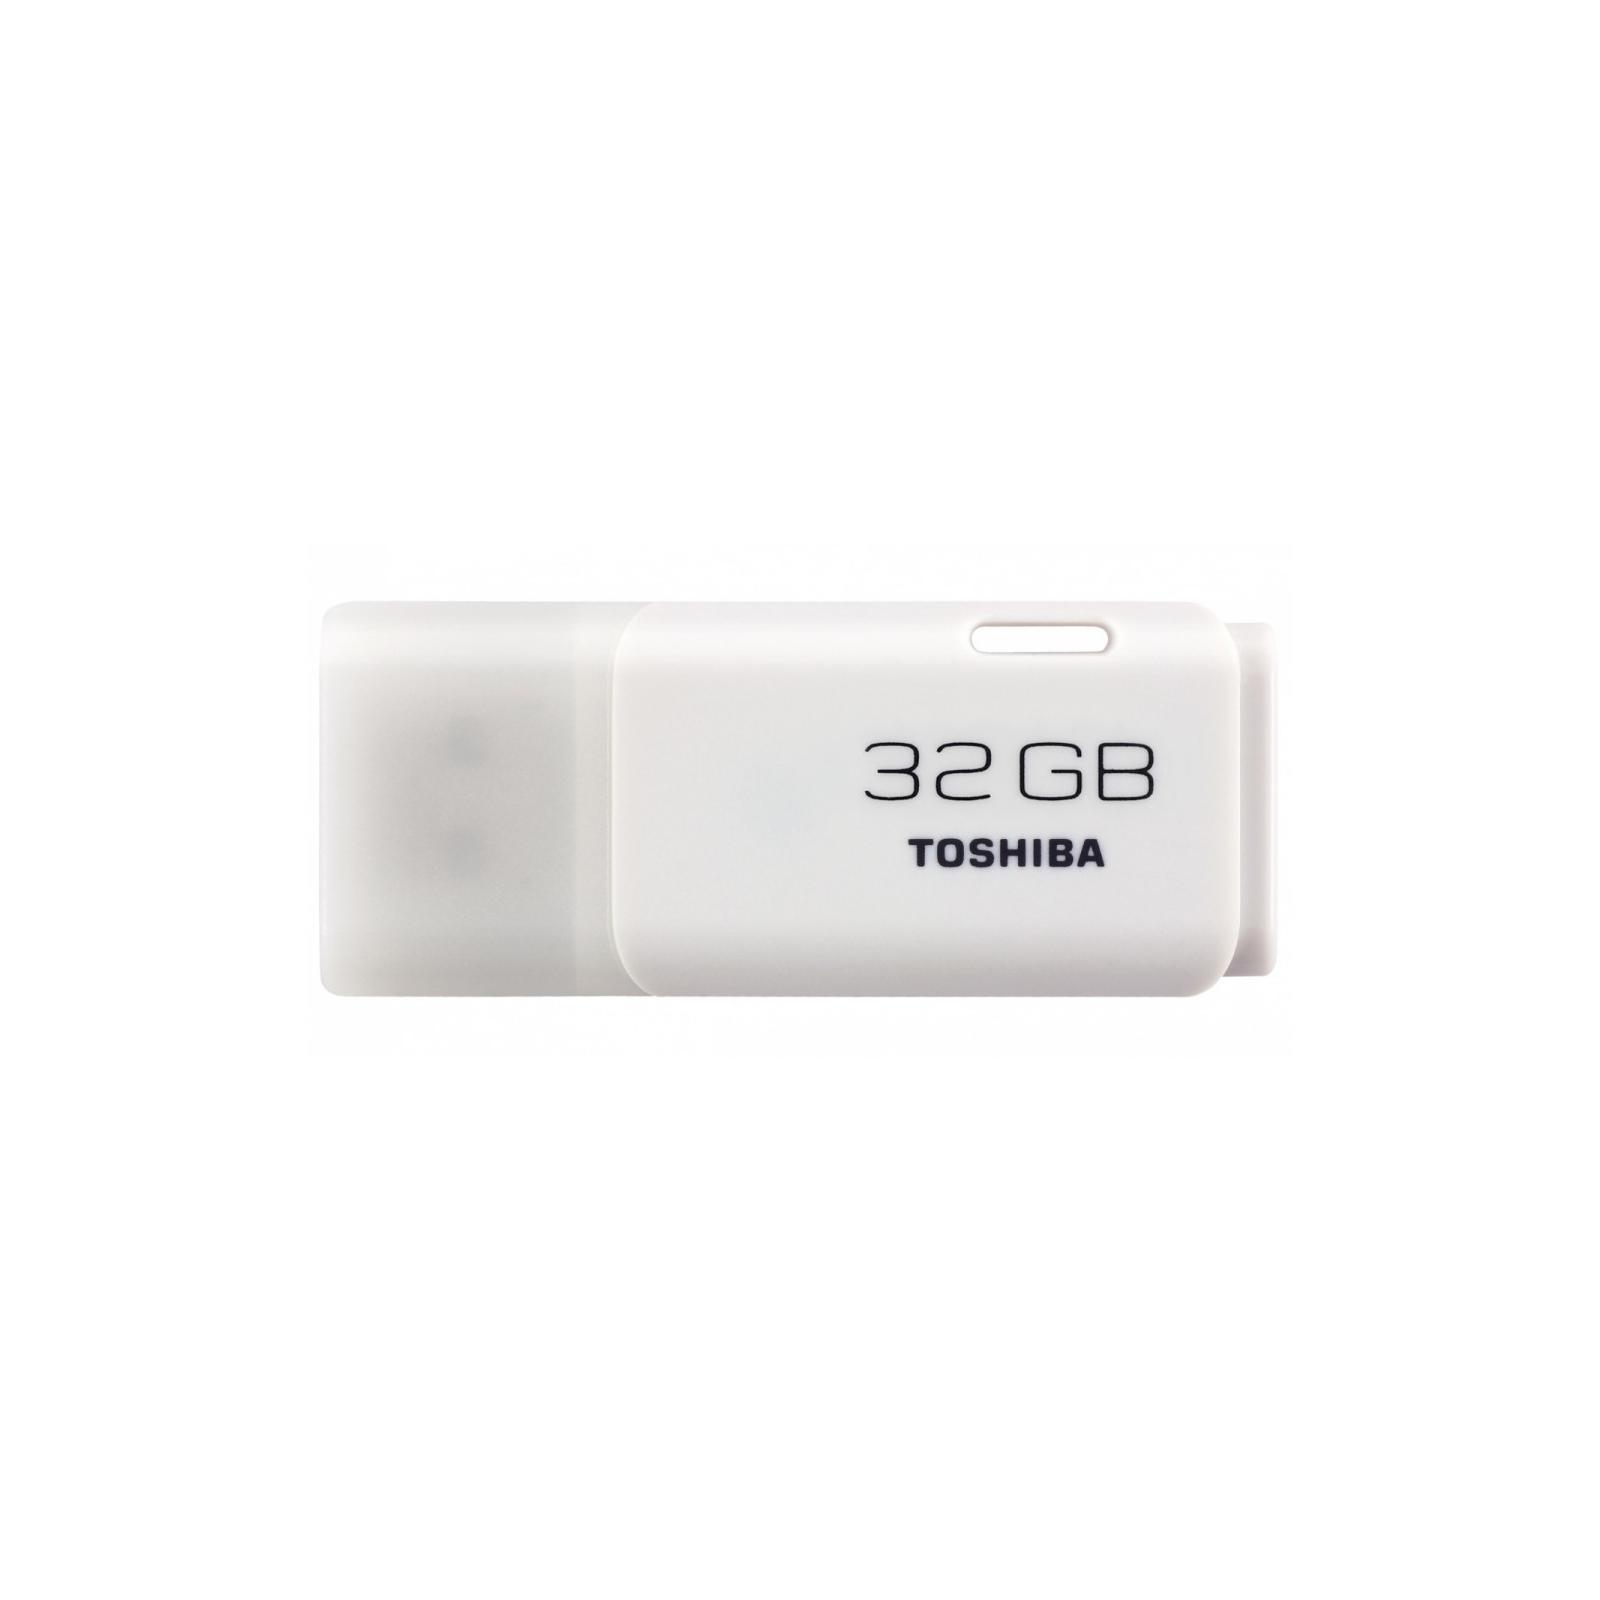 USB флеш накопитель TOSHIBA 32GB Hayabusa White USB 2.0 (THN-U202W0320E4)